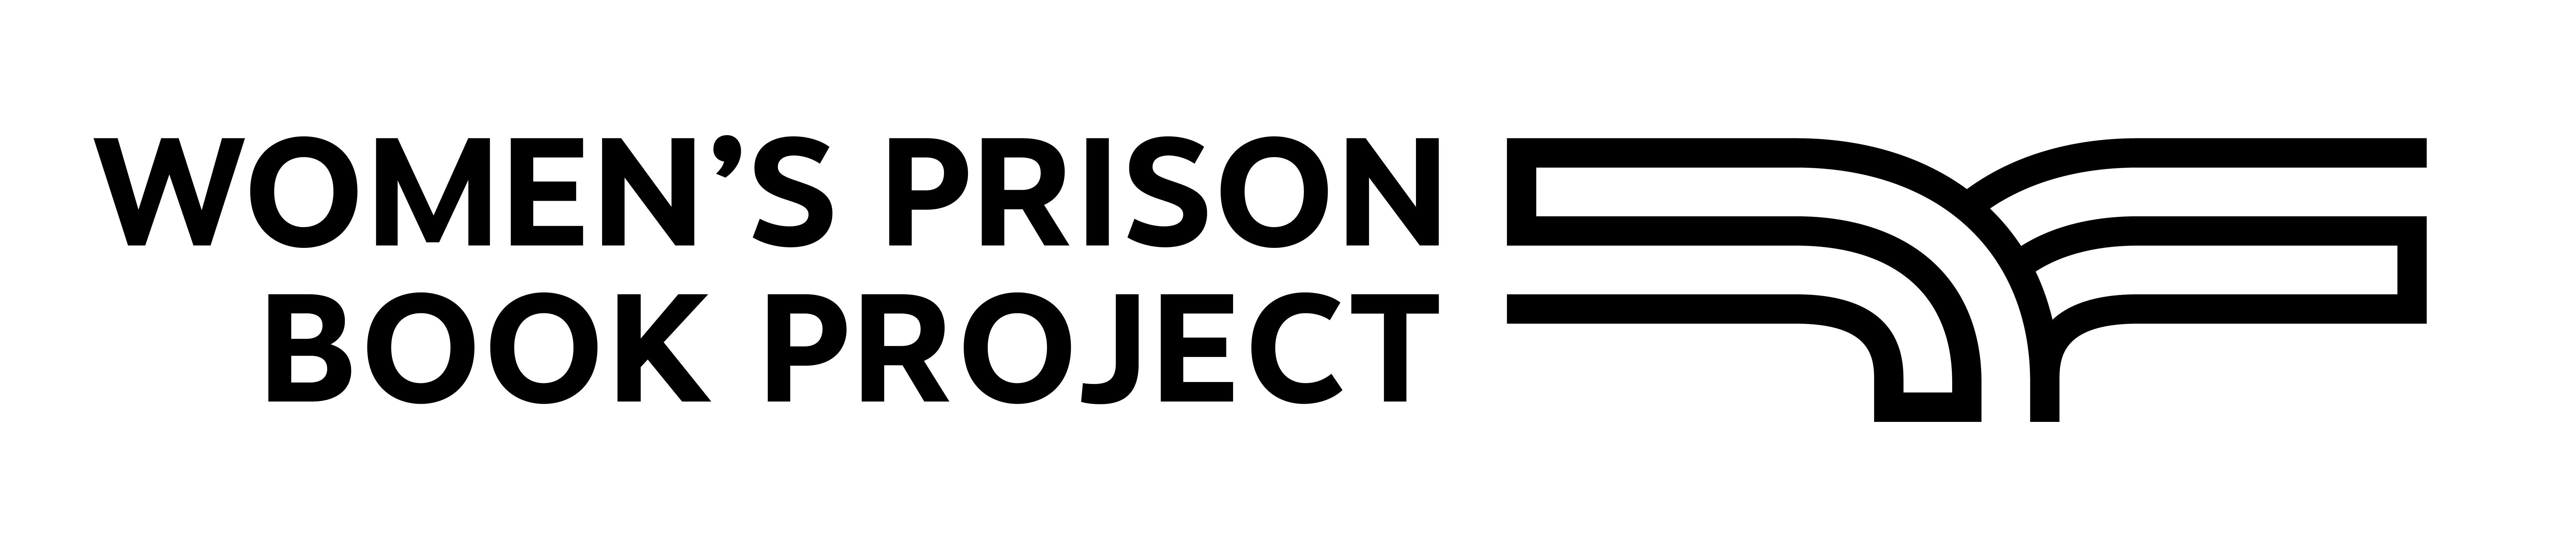 Women's Prison Book Project